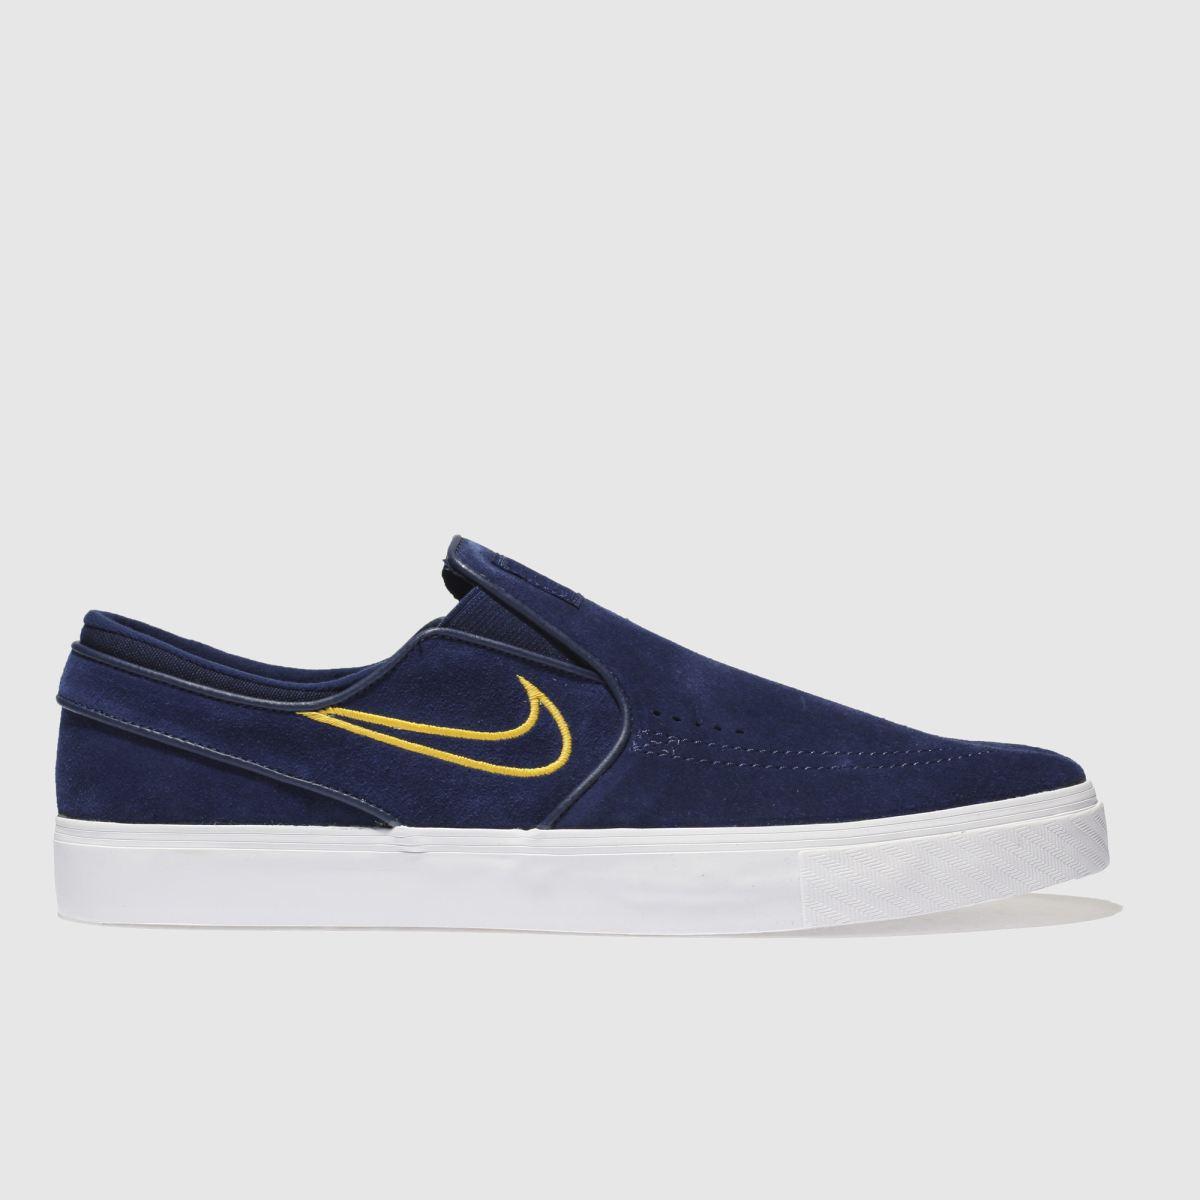 Nike Sb Navy Zoom Janoski Slip Trainers